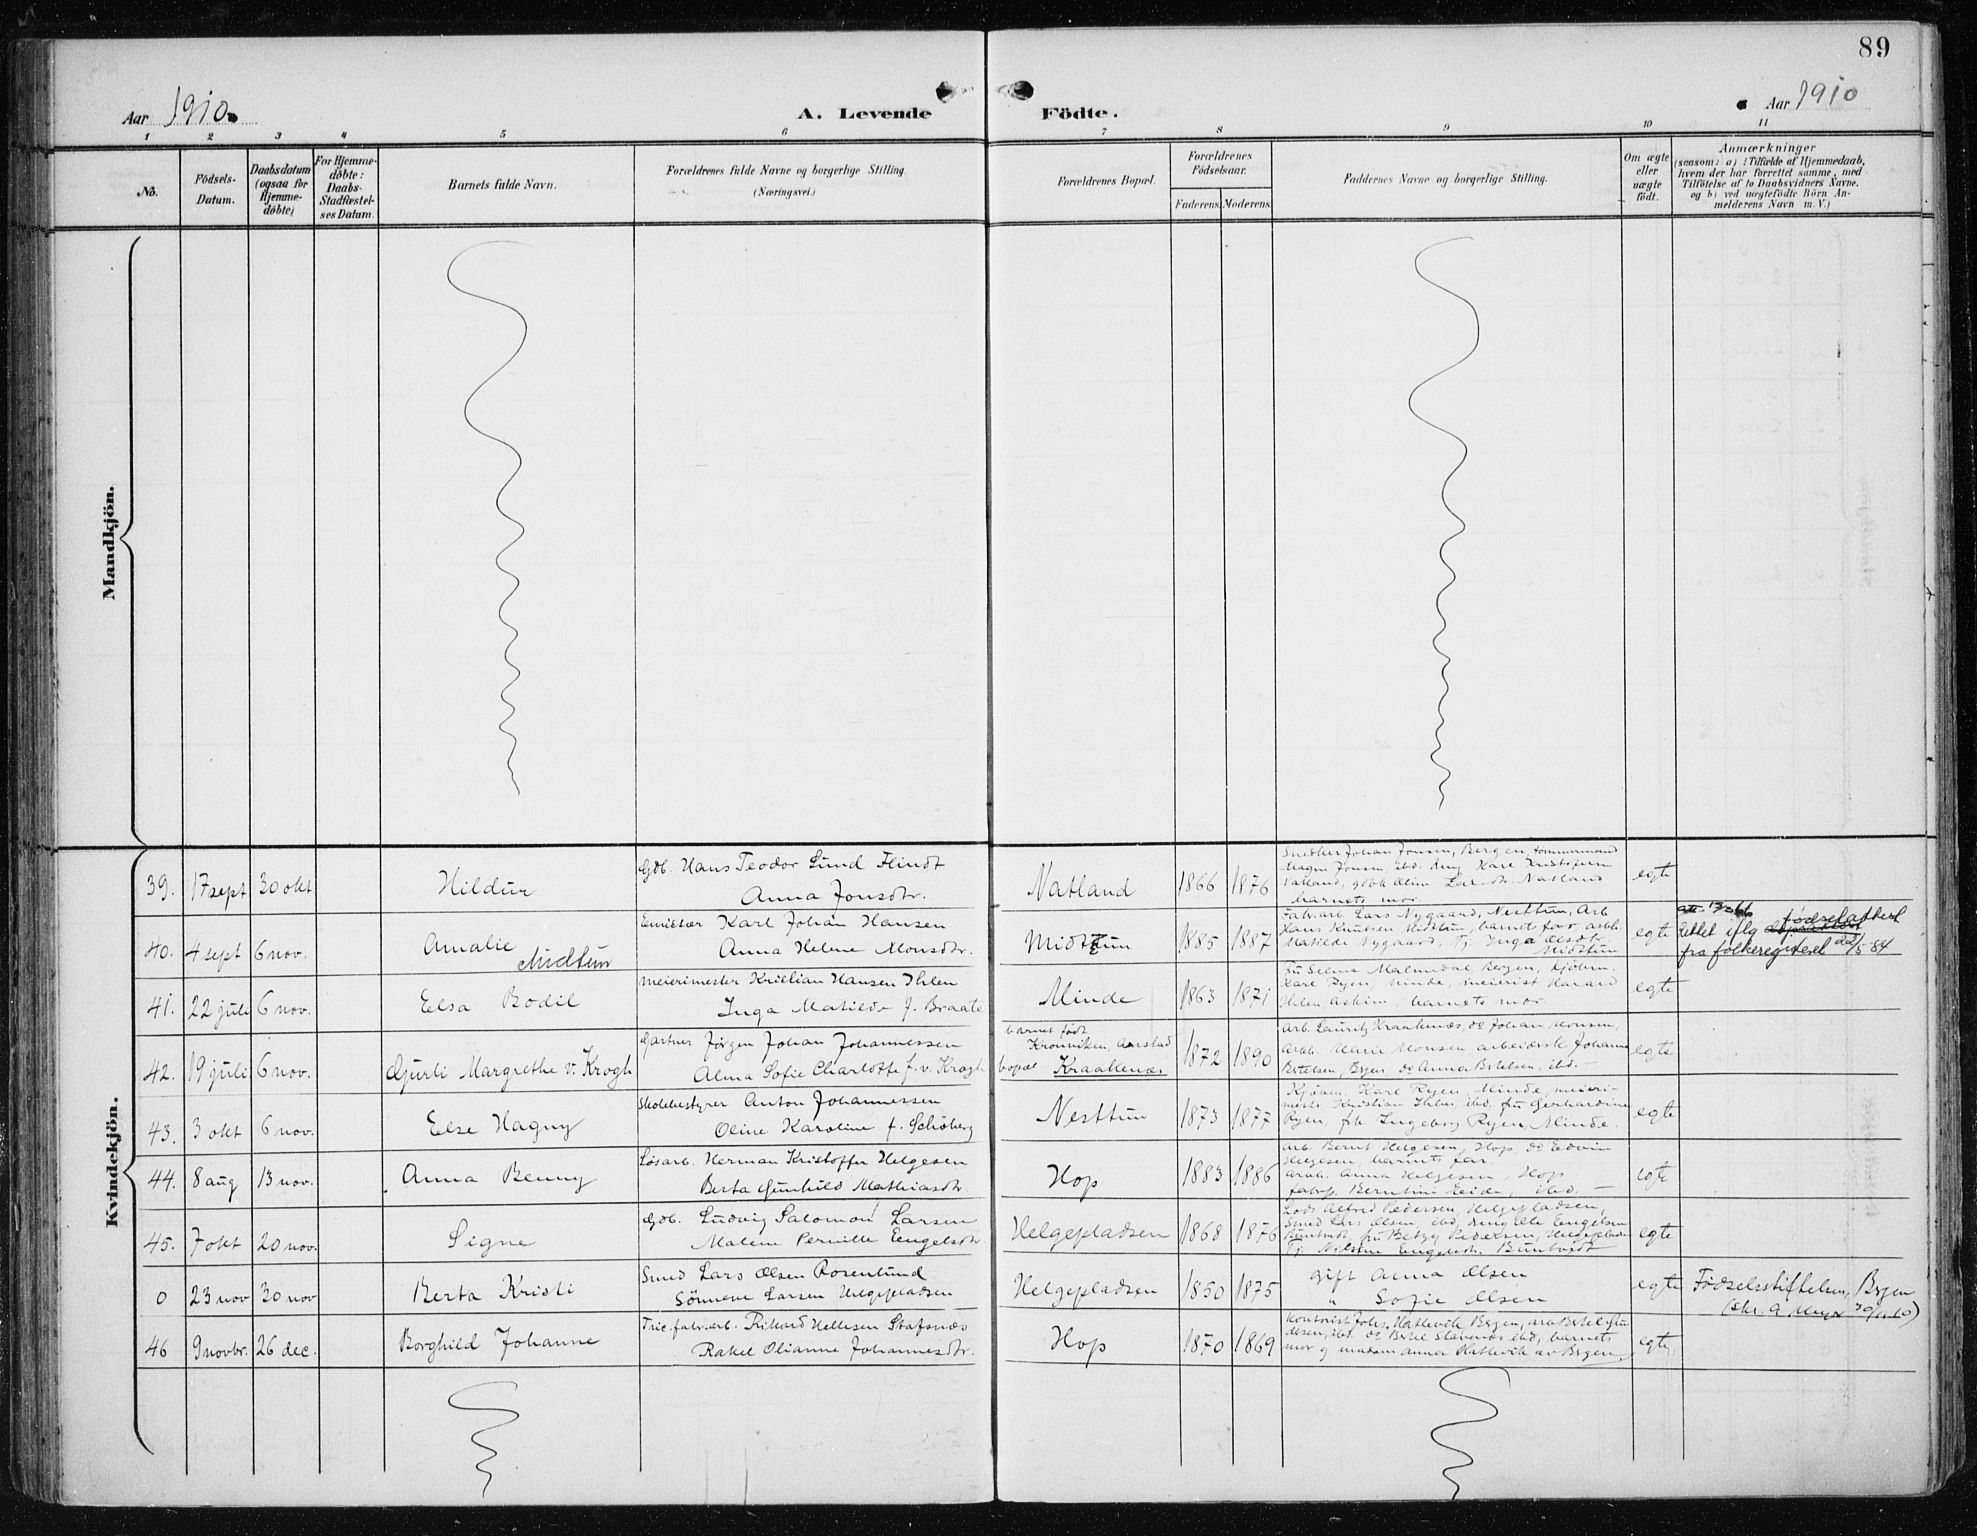 SAB, Fana Sokneprestembete, H/Haa/Haai/L0003: Ministerialbok nr. I 3, 1900-1912, s. 89